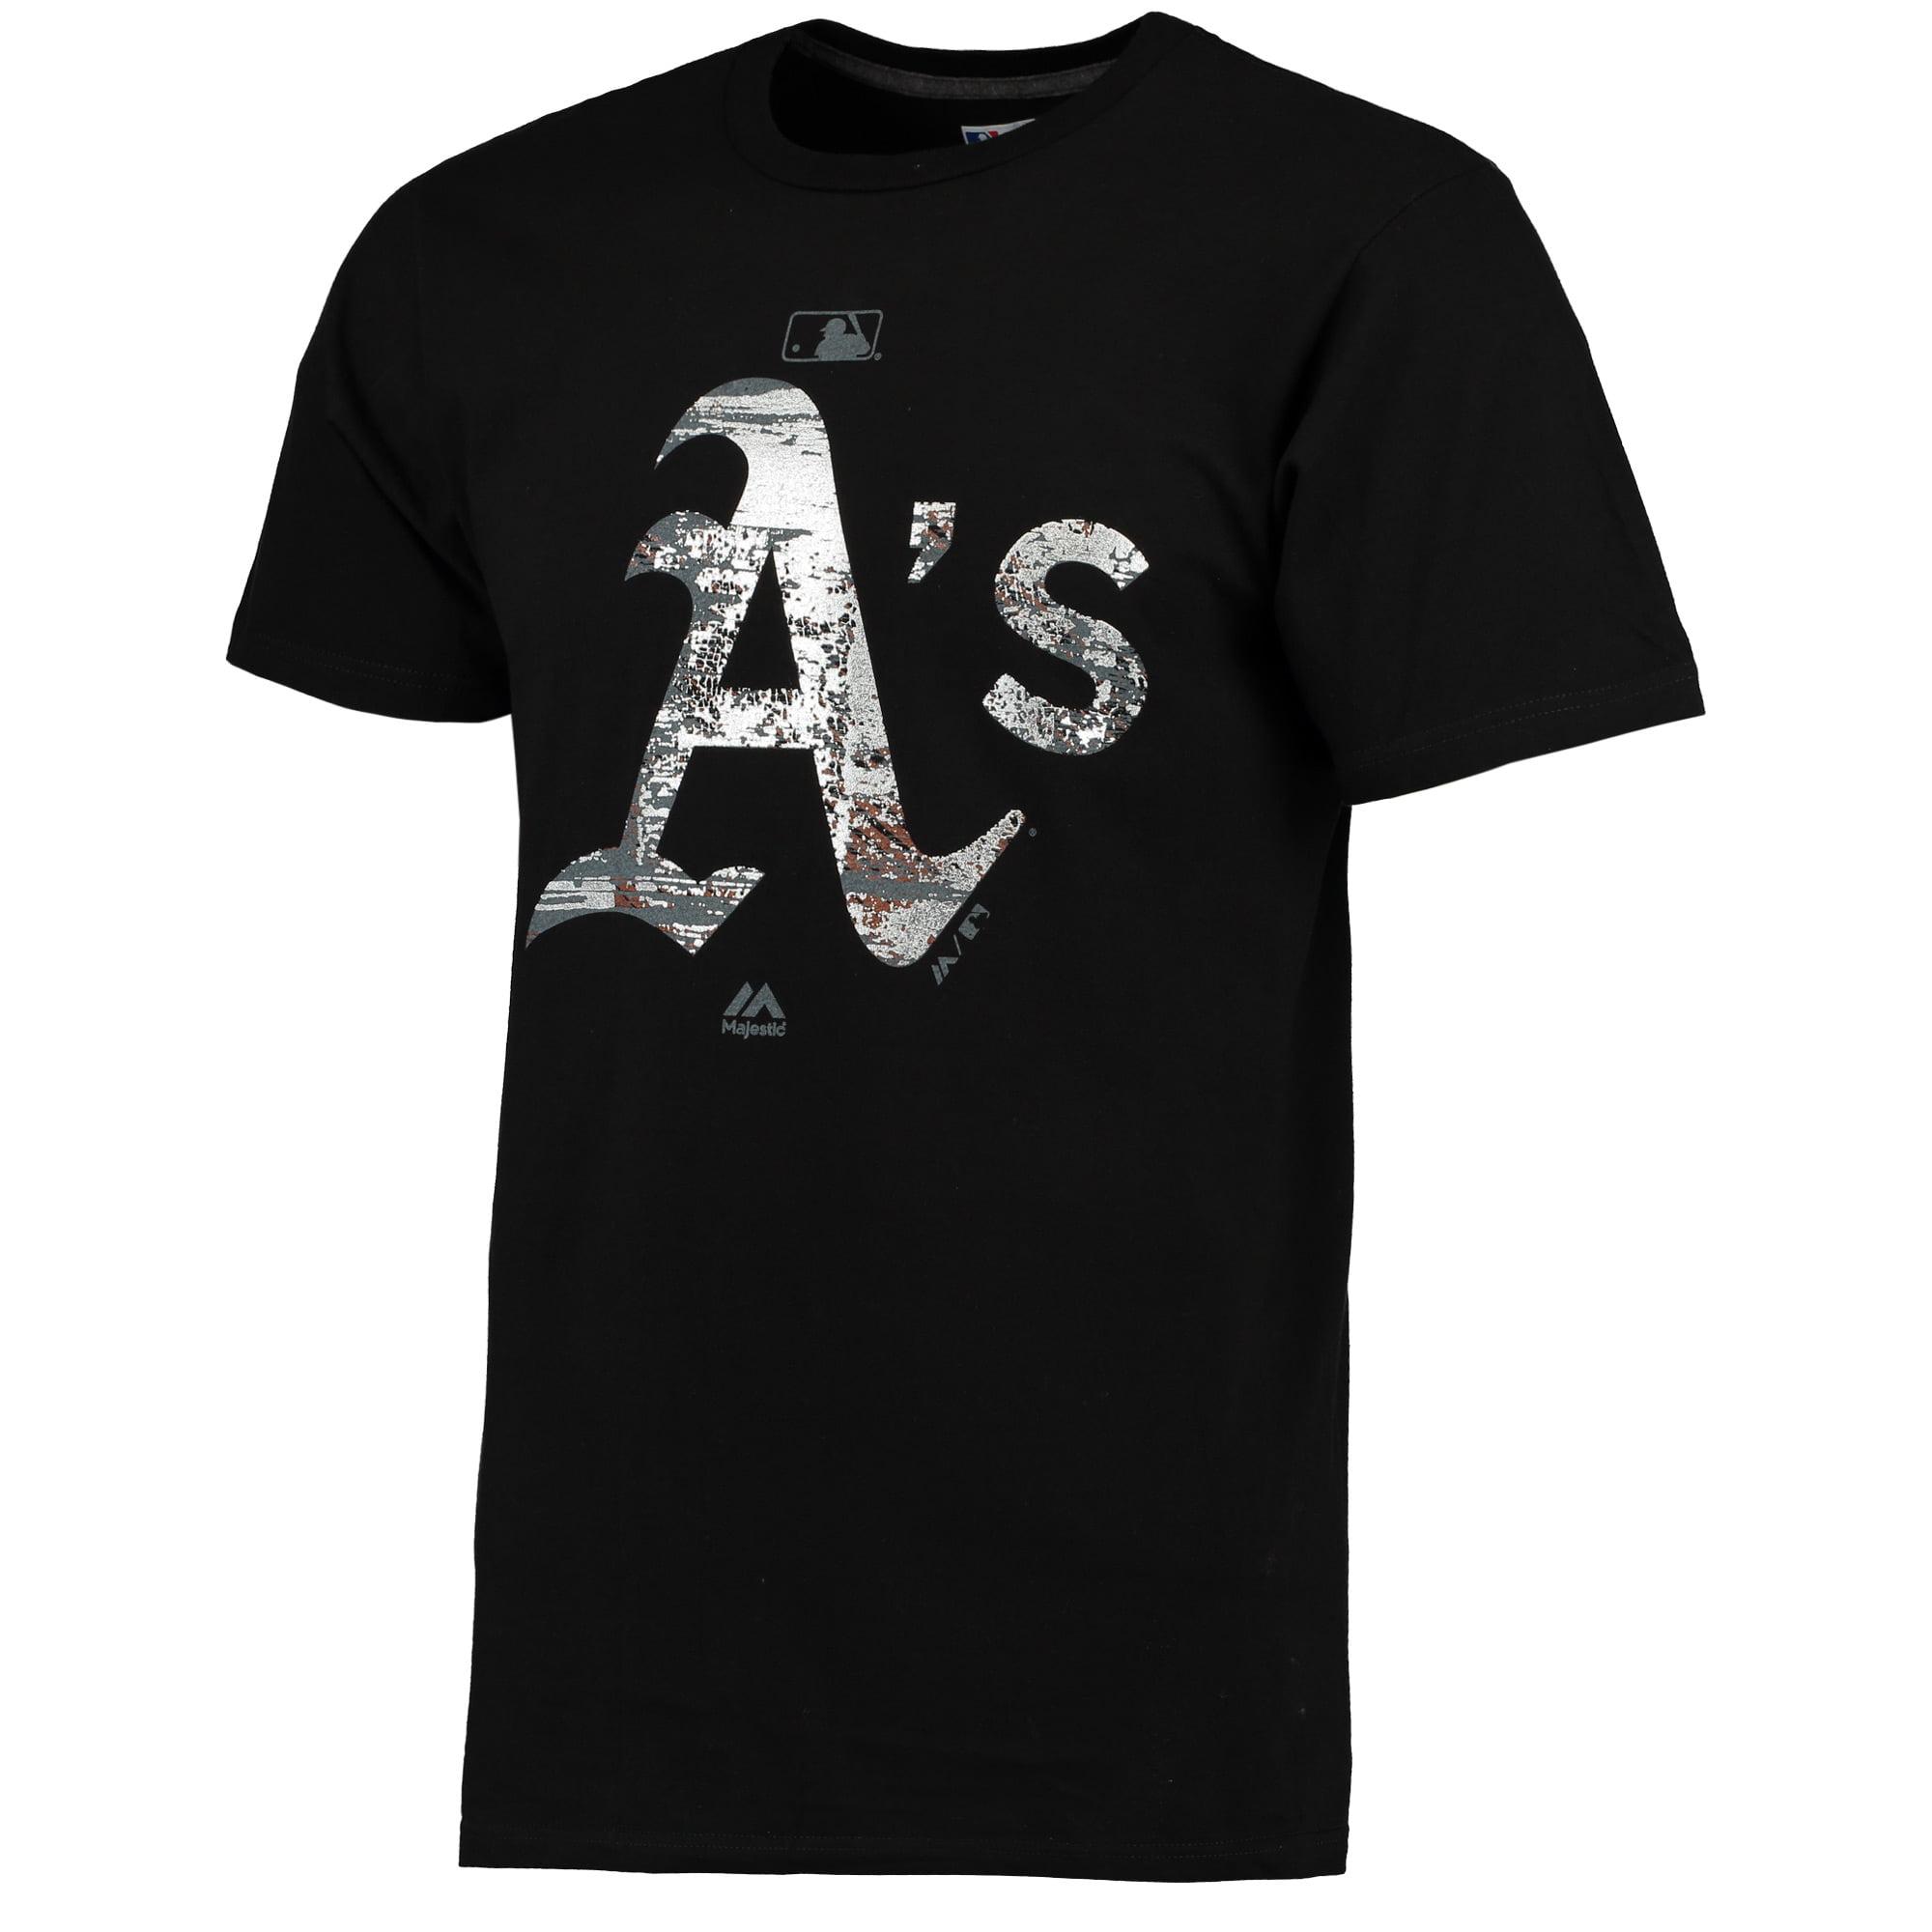 Oakland Athletics Majestic Authentic Collection Clubhouse Fashion Foil T-Shirt - Black